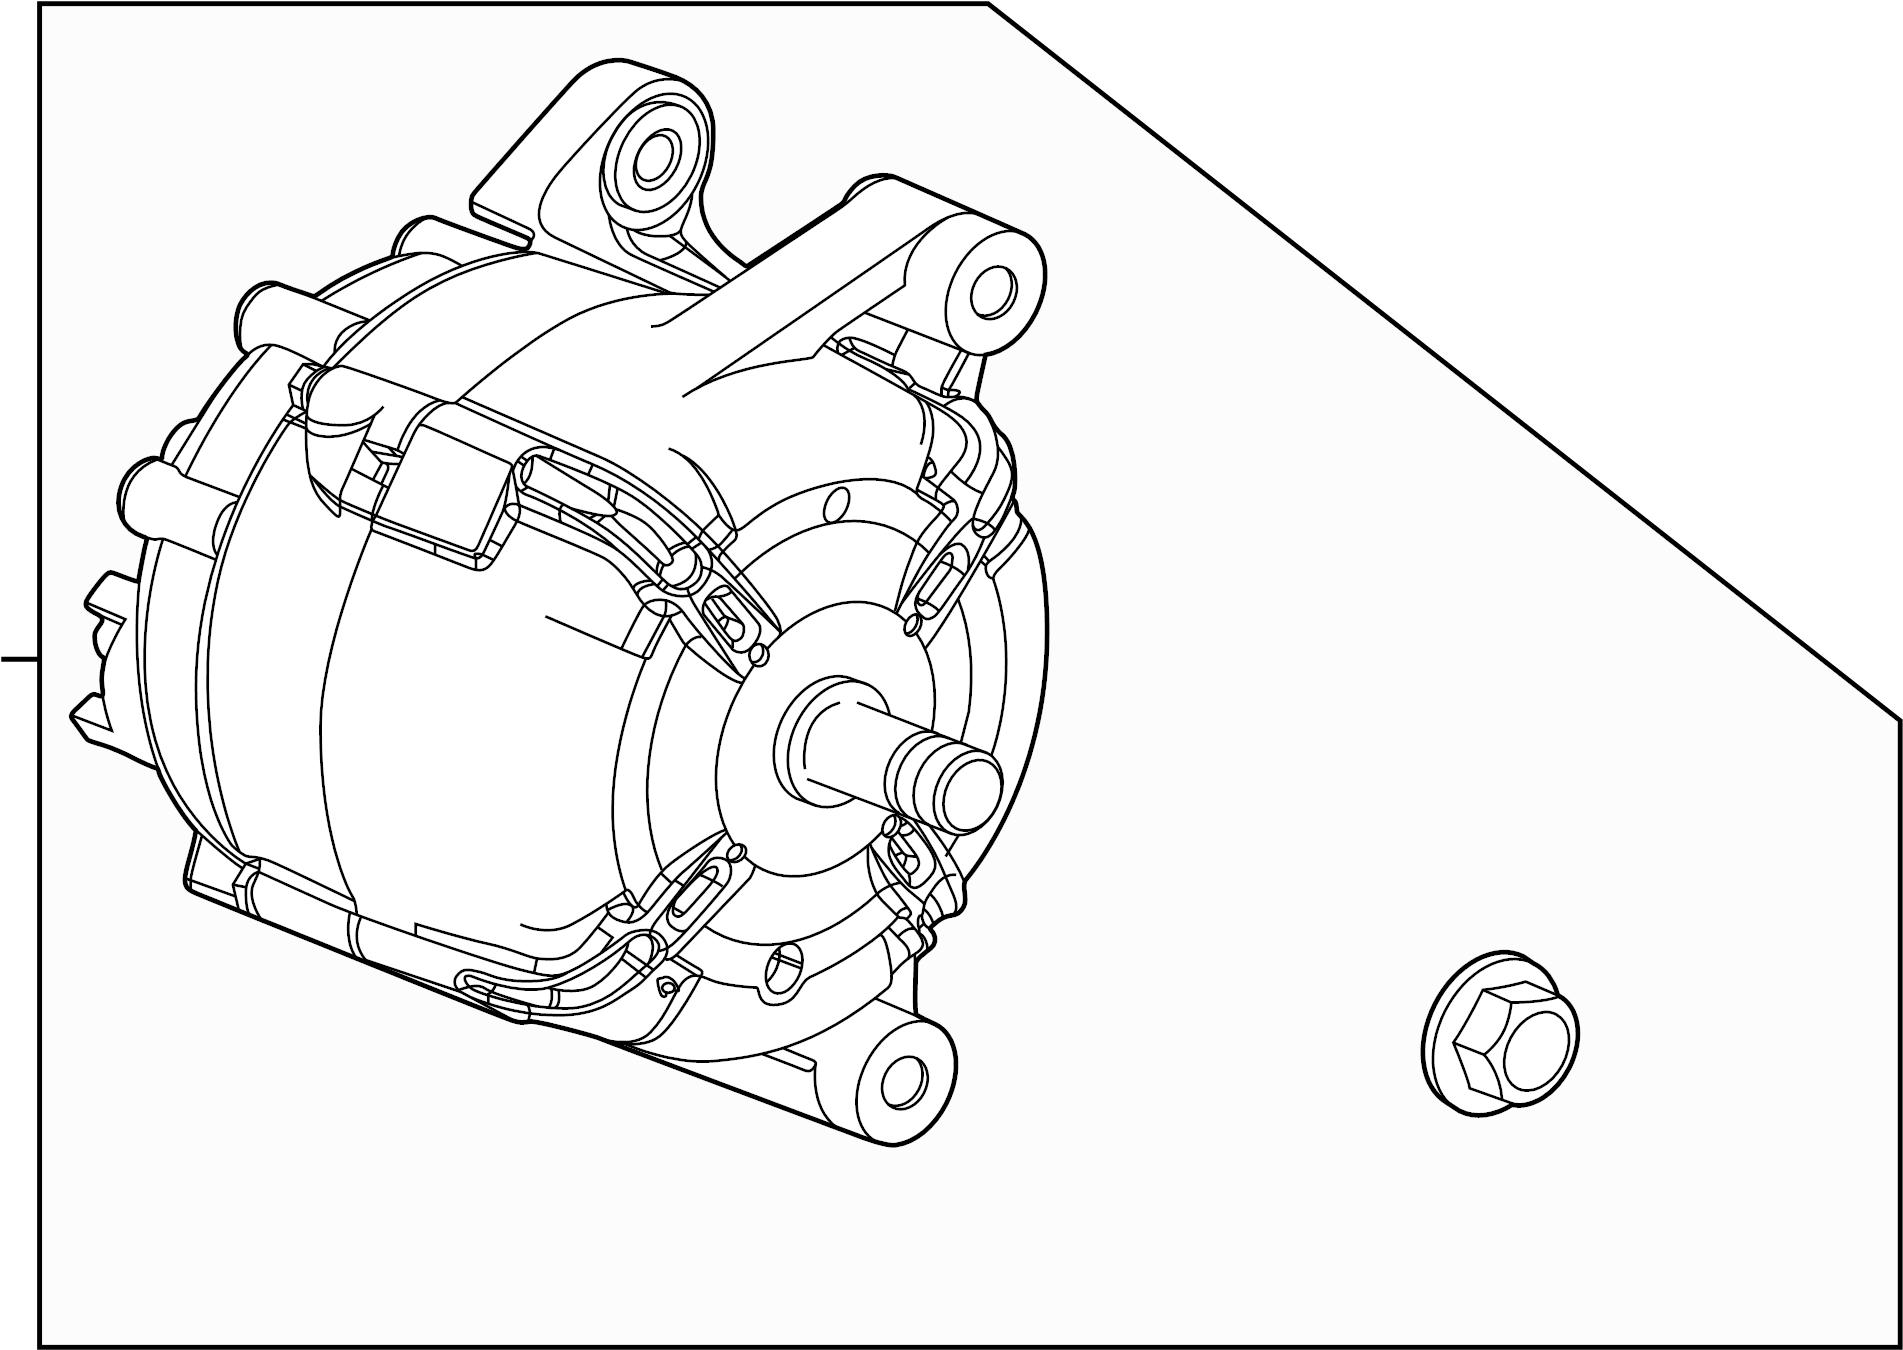 chevrolet cruze ltz generator  buick  chevrolet  chevrolet